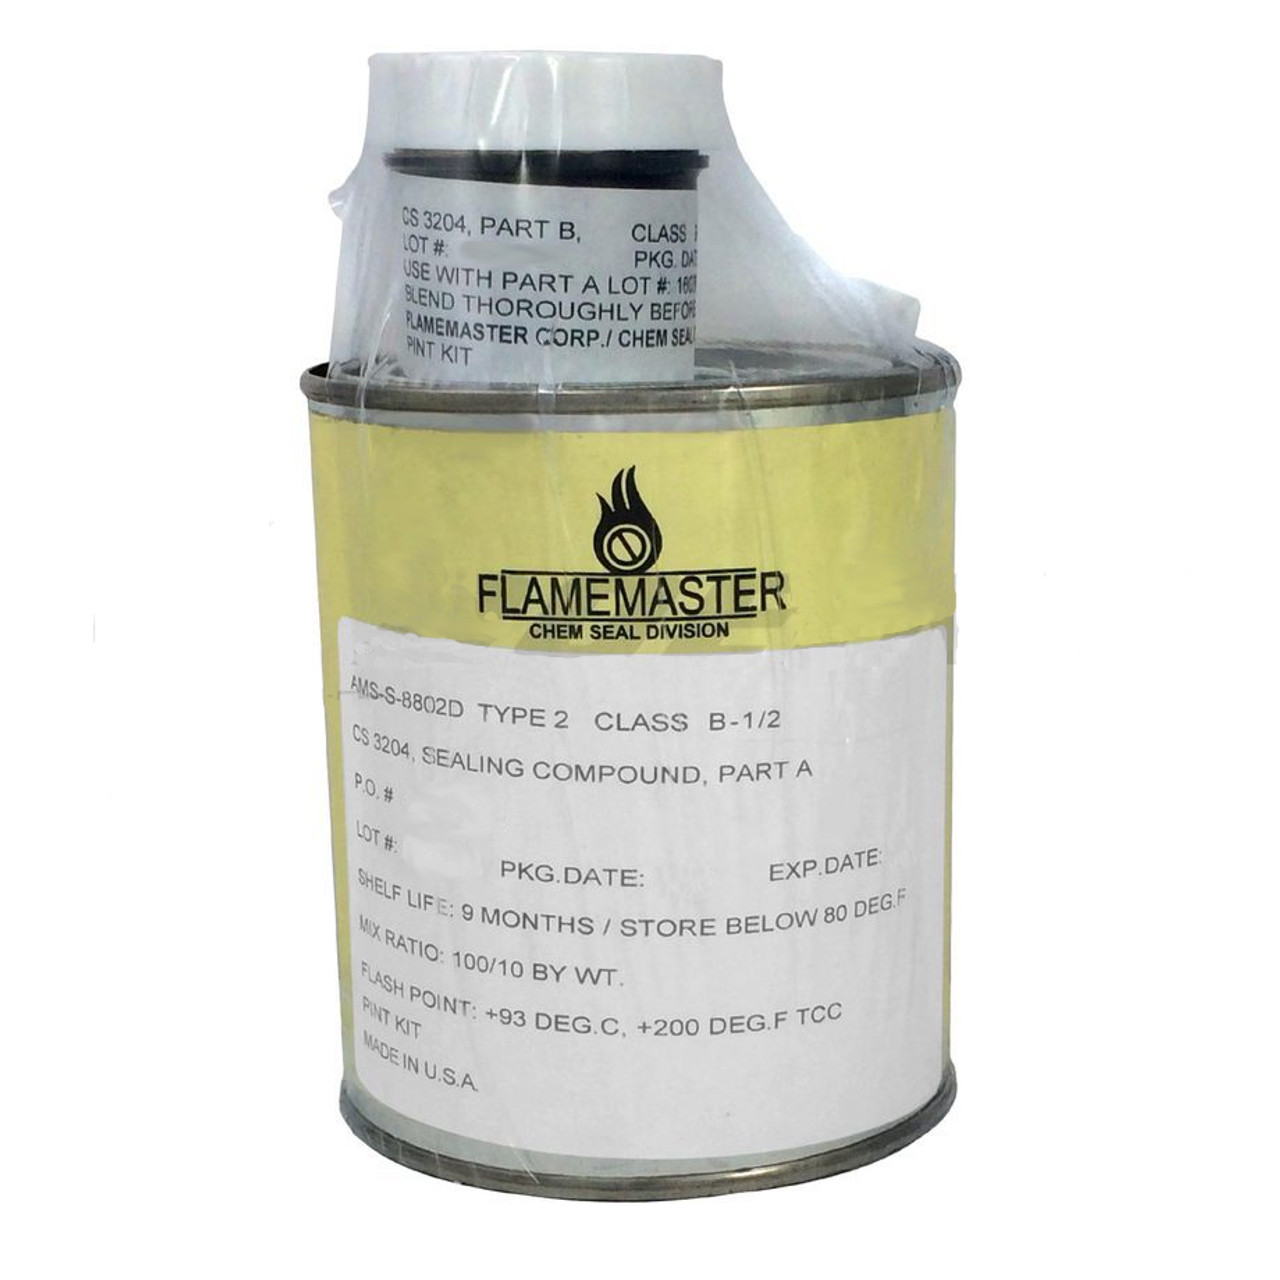 Flamemaster Chemseal CS3204-B1-2-PT Pint